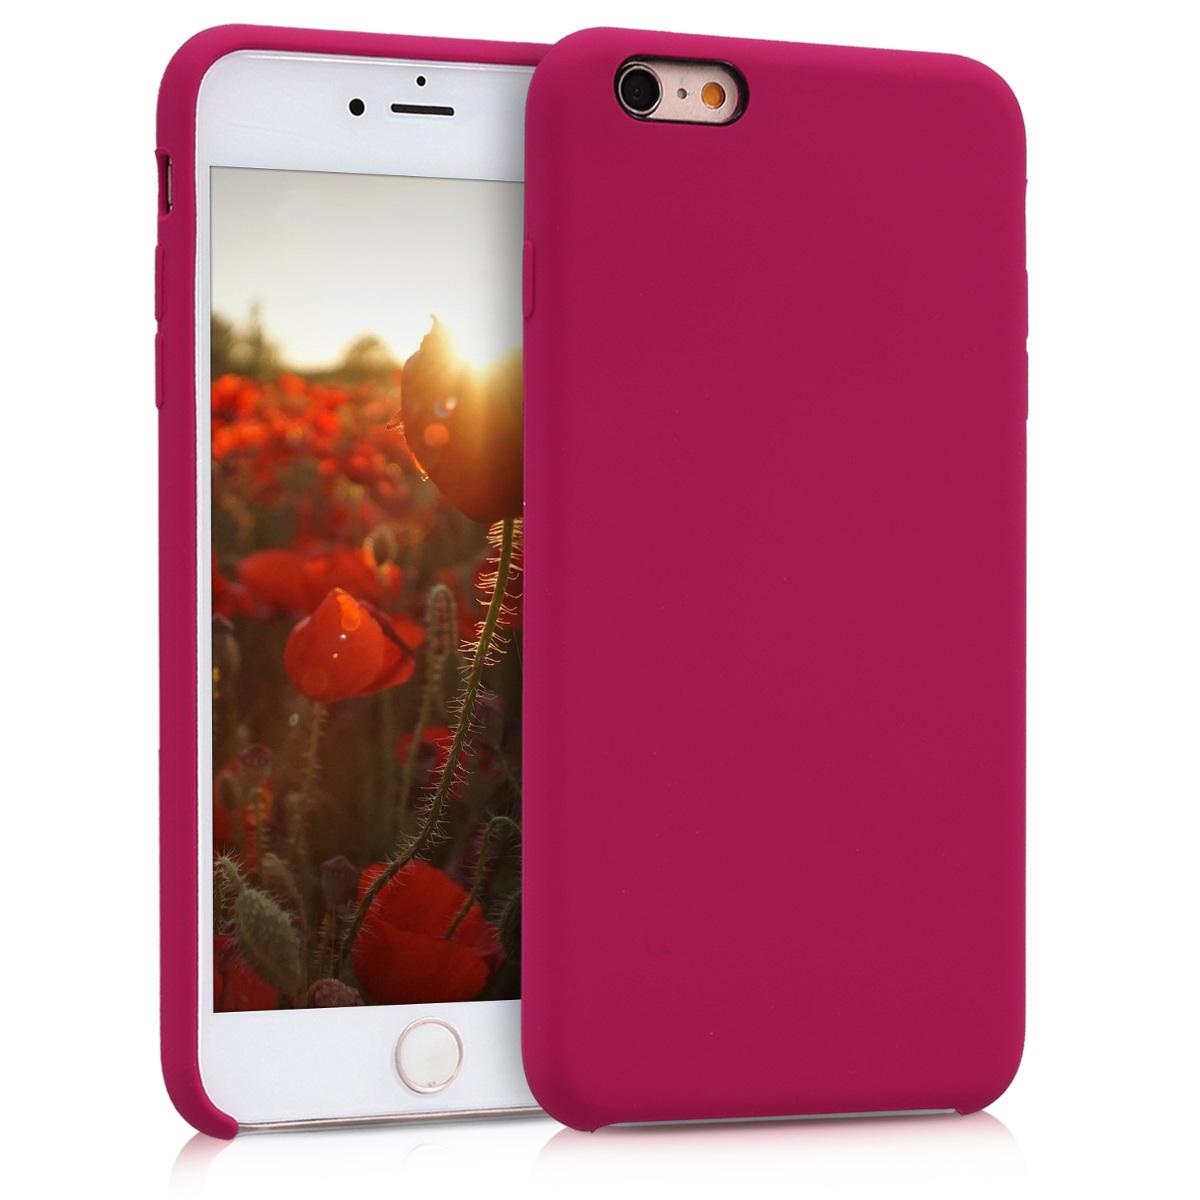 Kvalitní silikonové TPU pouzdro pro Apple iPhone 6 Plus / 6S - Fuchsia | Red